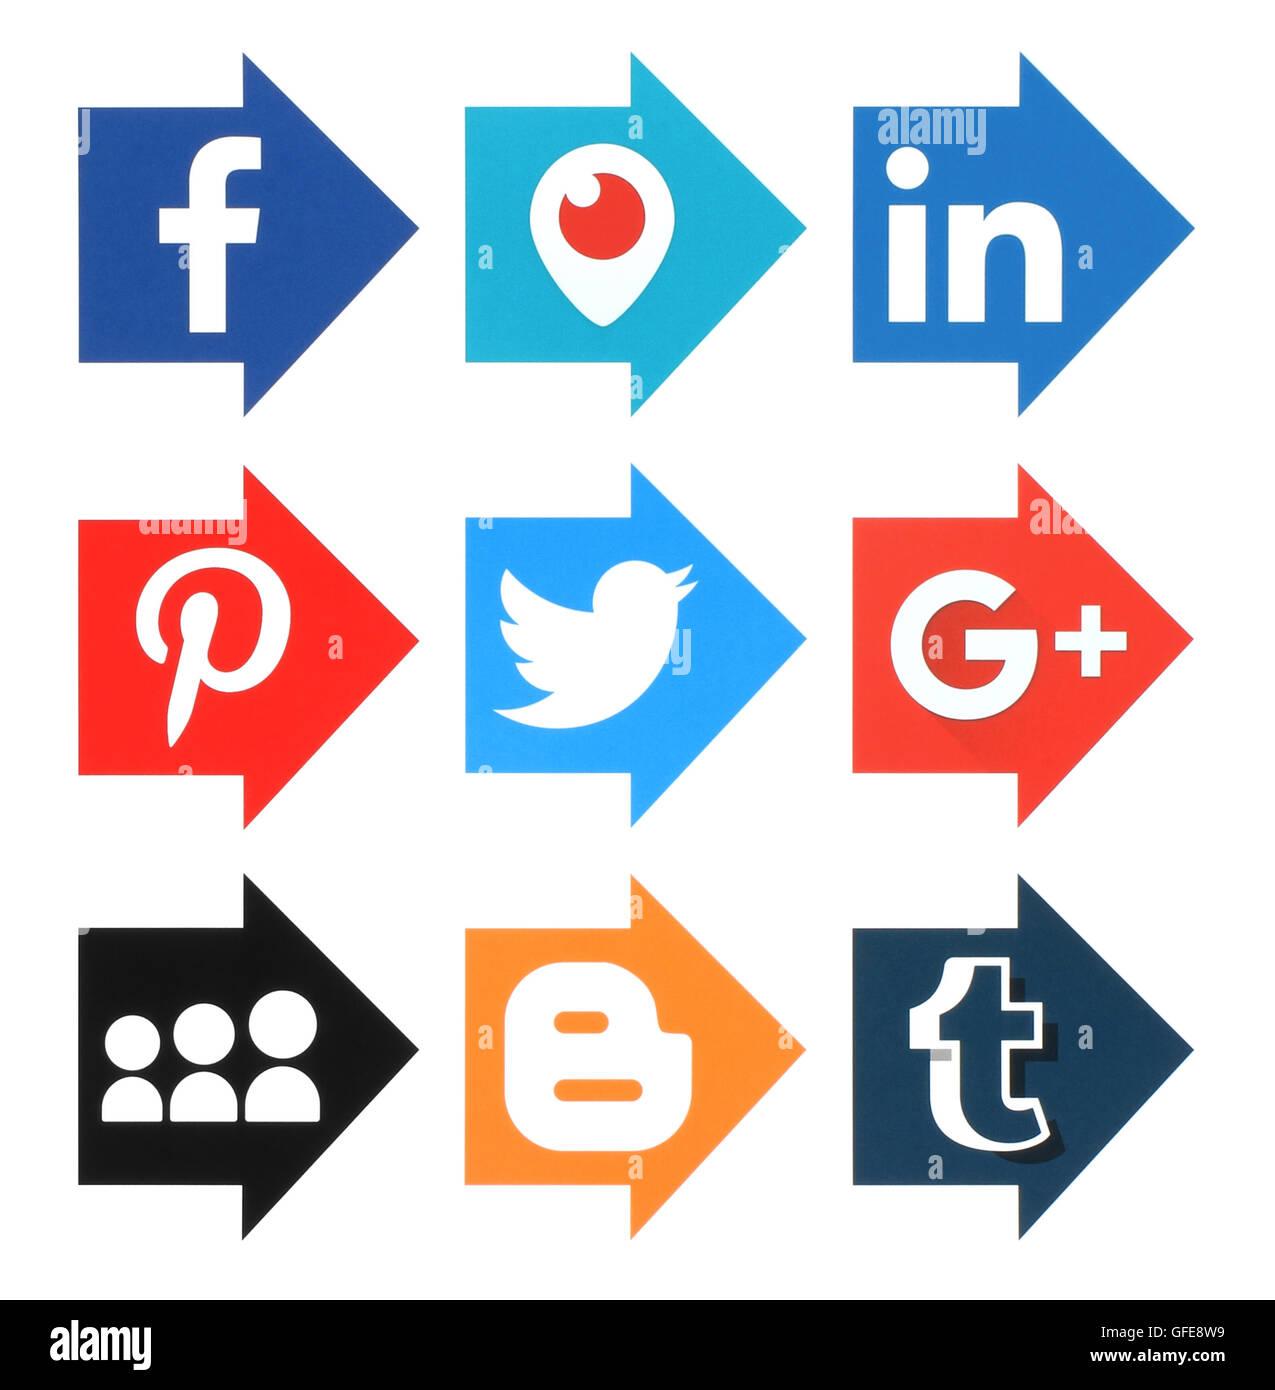 Kiev, Ukraine - April 19, 2016: Collection of popular arrow shape social media logos printed on paper:Facebook, - Stock Image